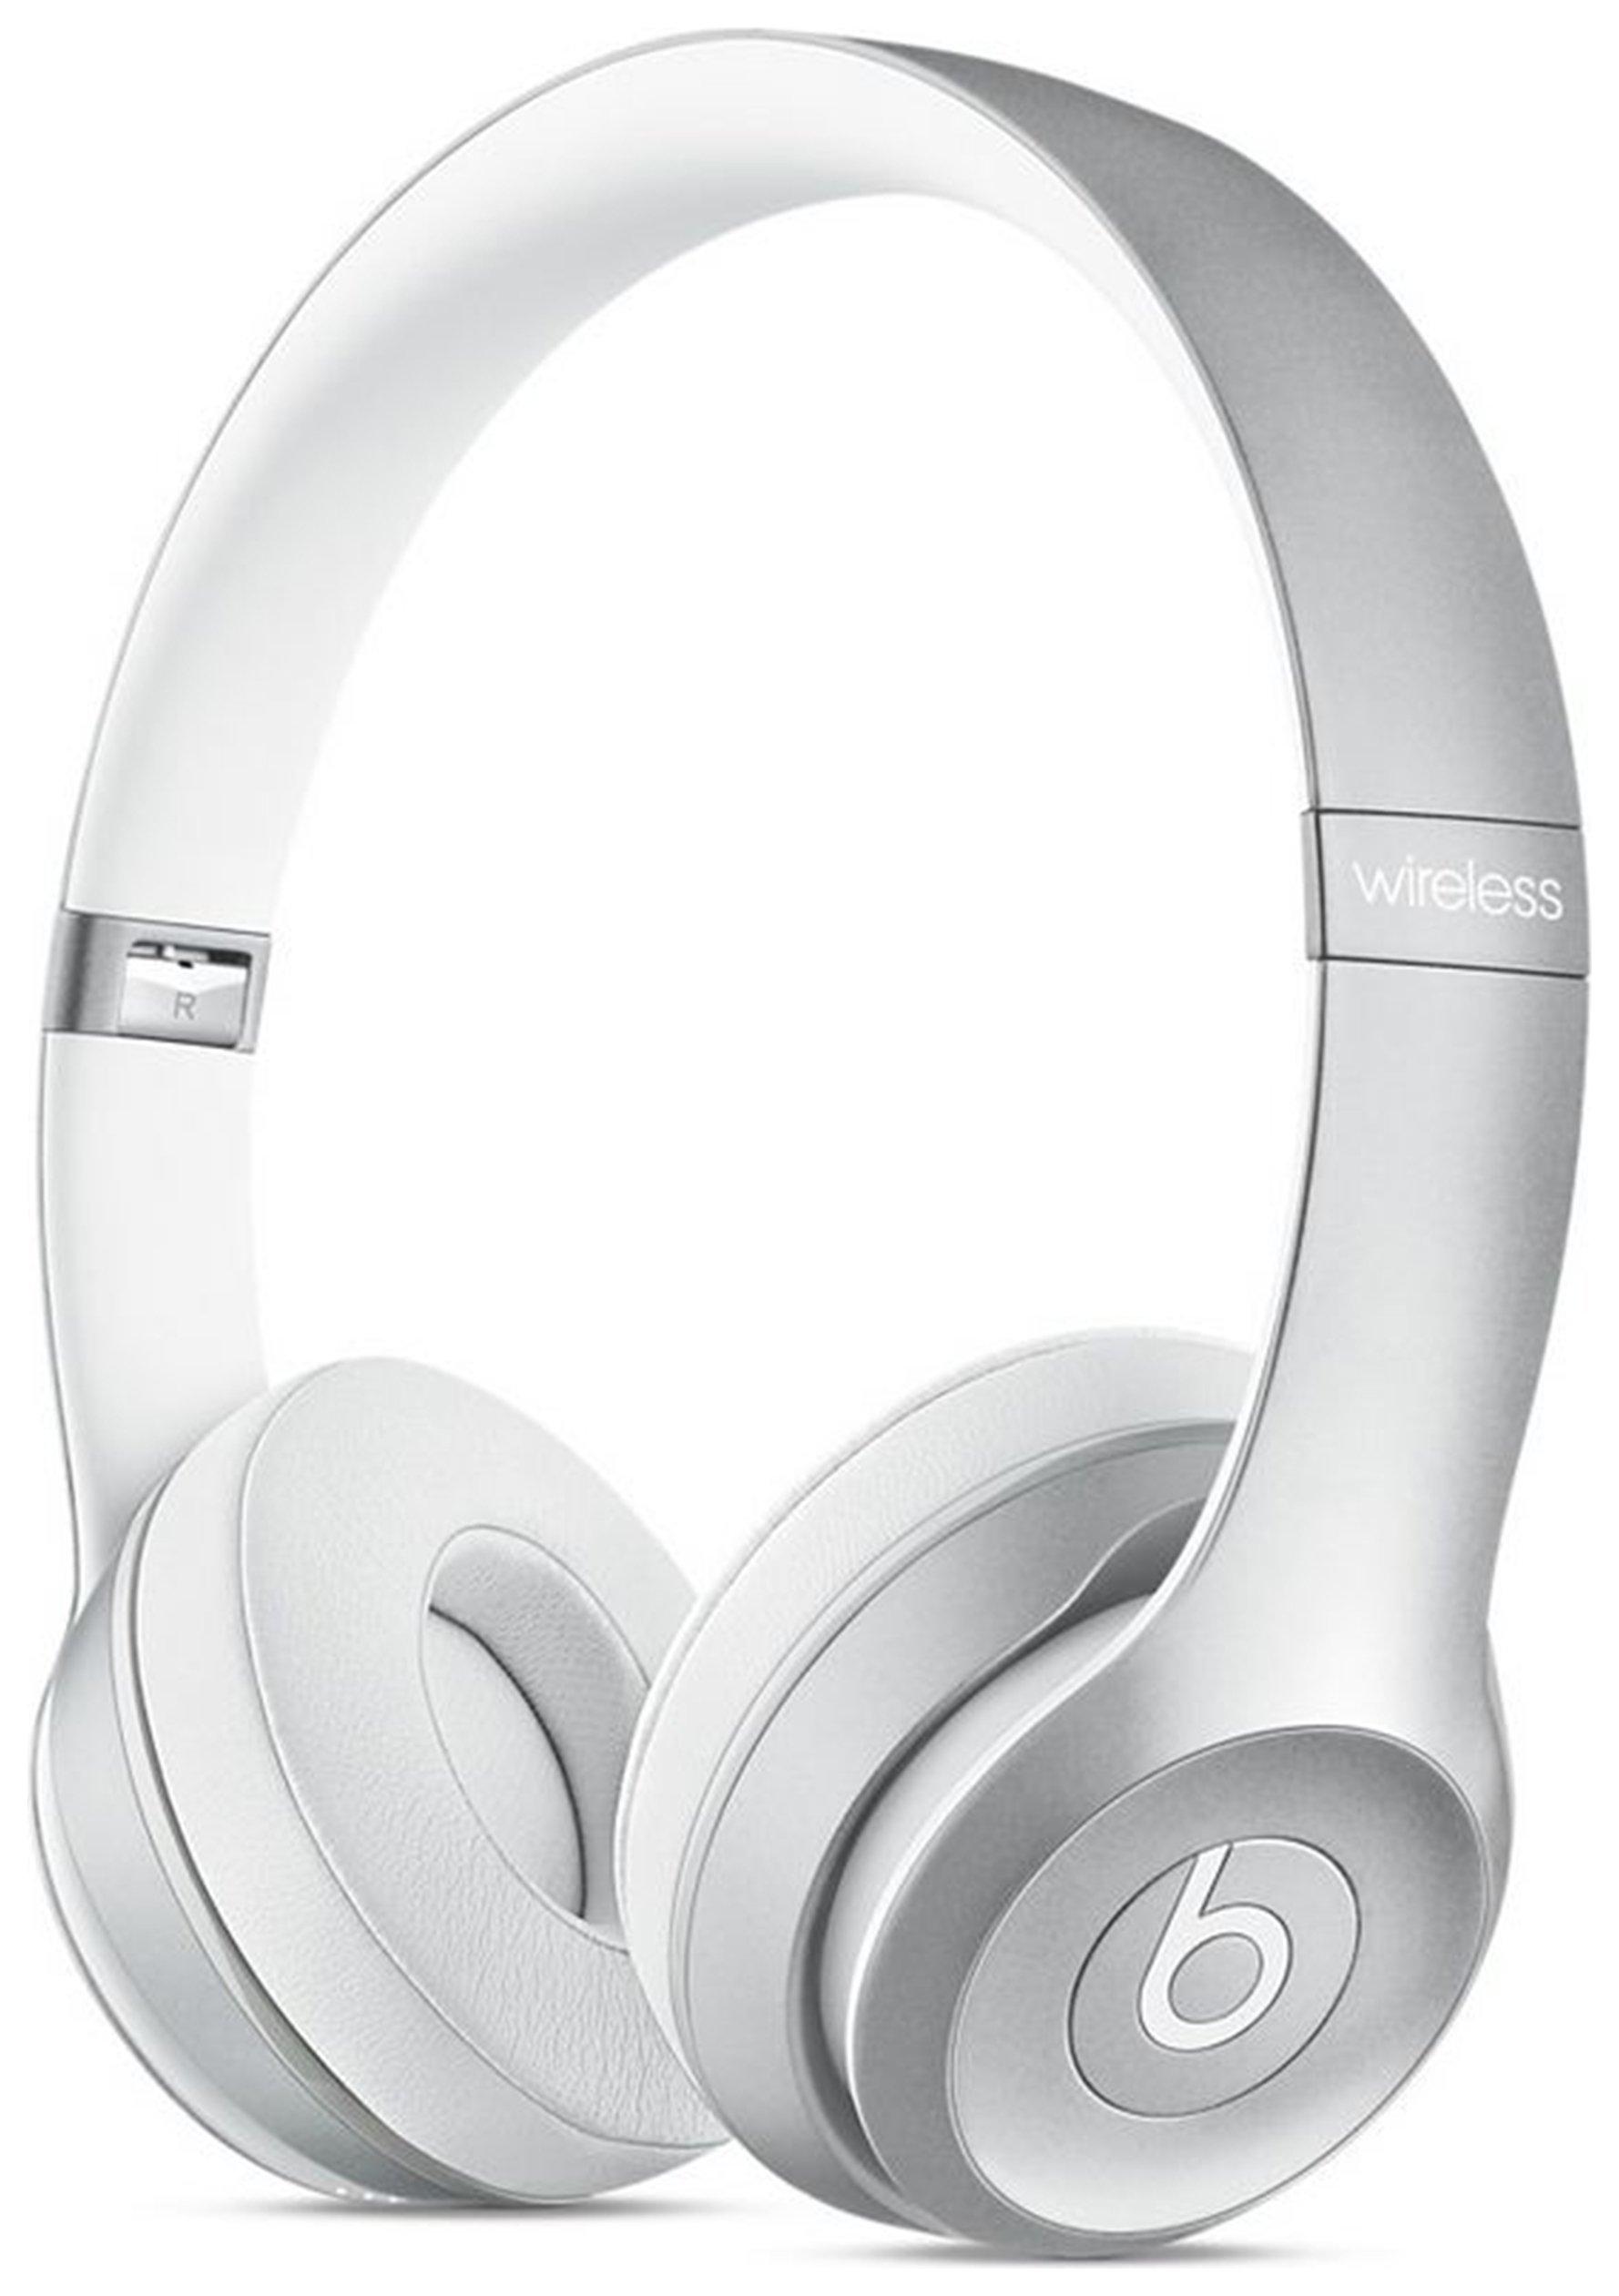 Image of Beats Wireless On Ear Headphones - Silver.